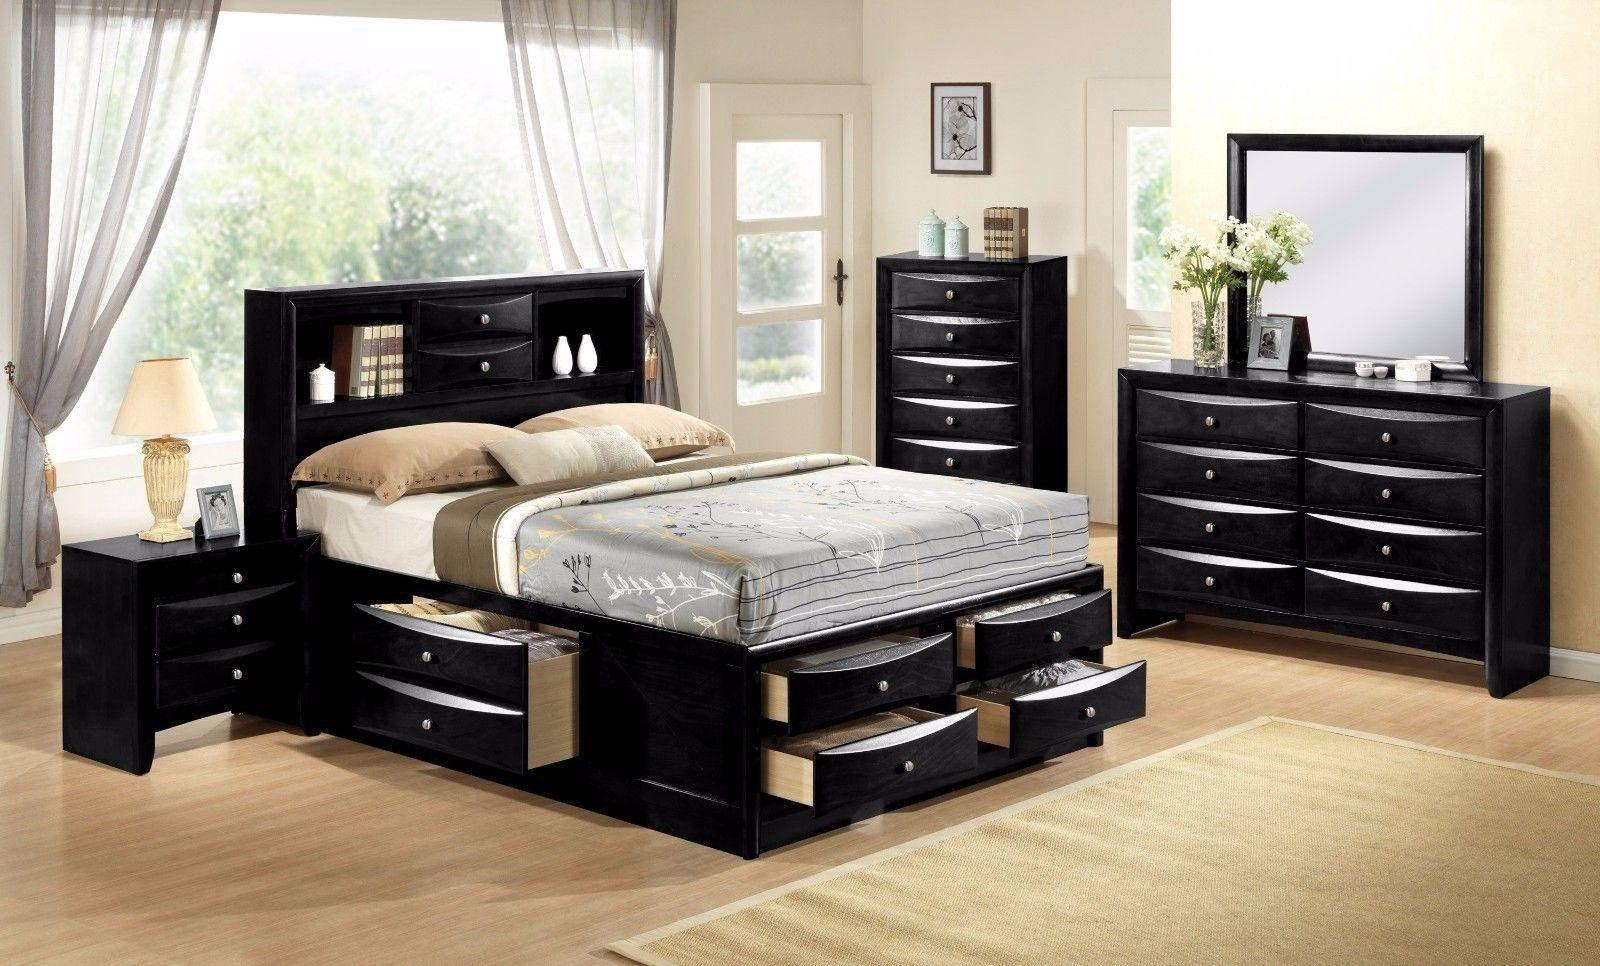 7 Piece Bedroom Set Fresh Crown Mark B4285 Emily Modern Black Finish Storage King Size